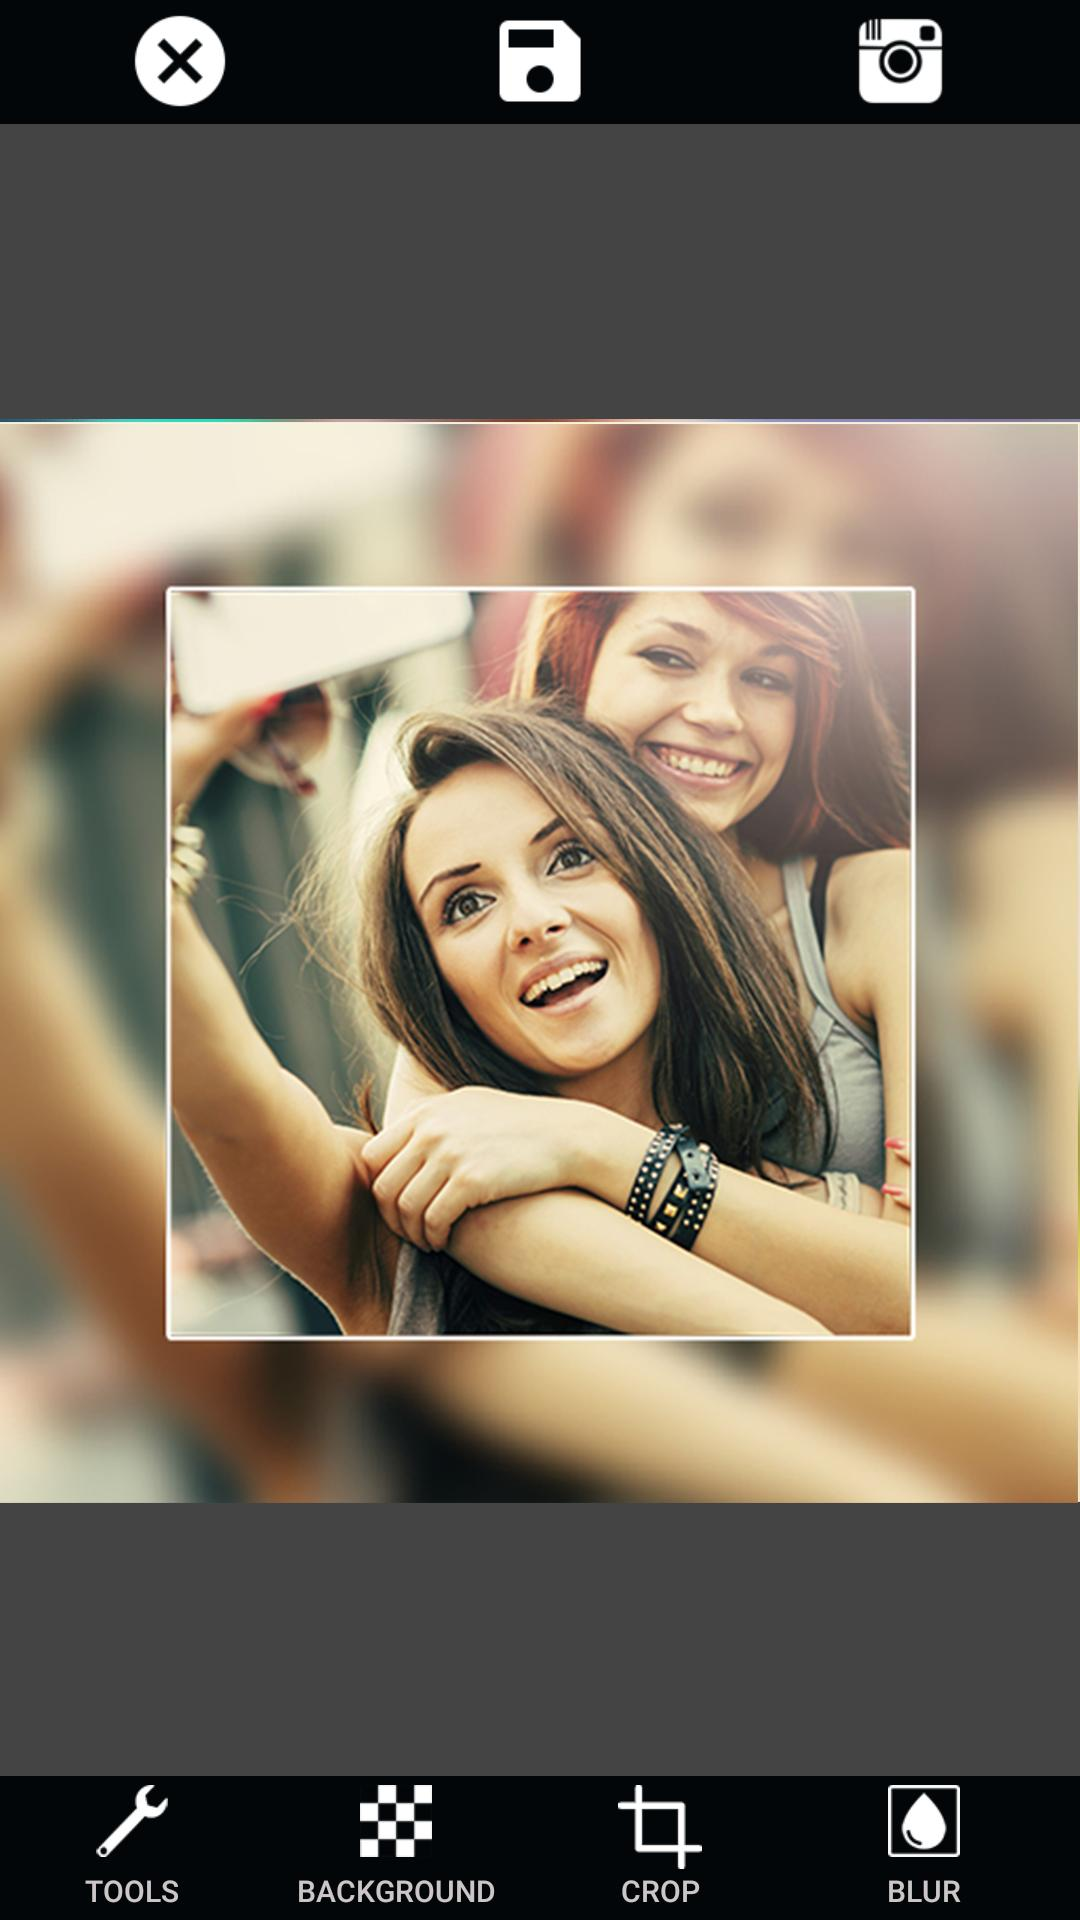 Selfie Camera Editor: Take Selfies & Edit Photos 2.2.2 Screenshot 13